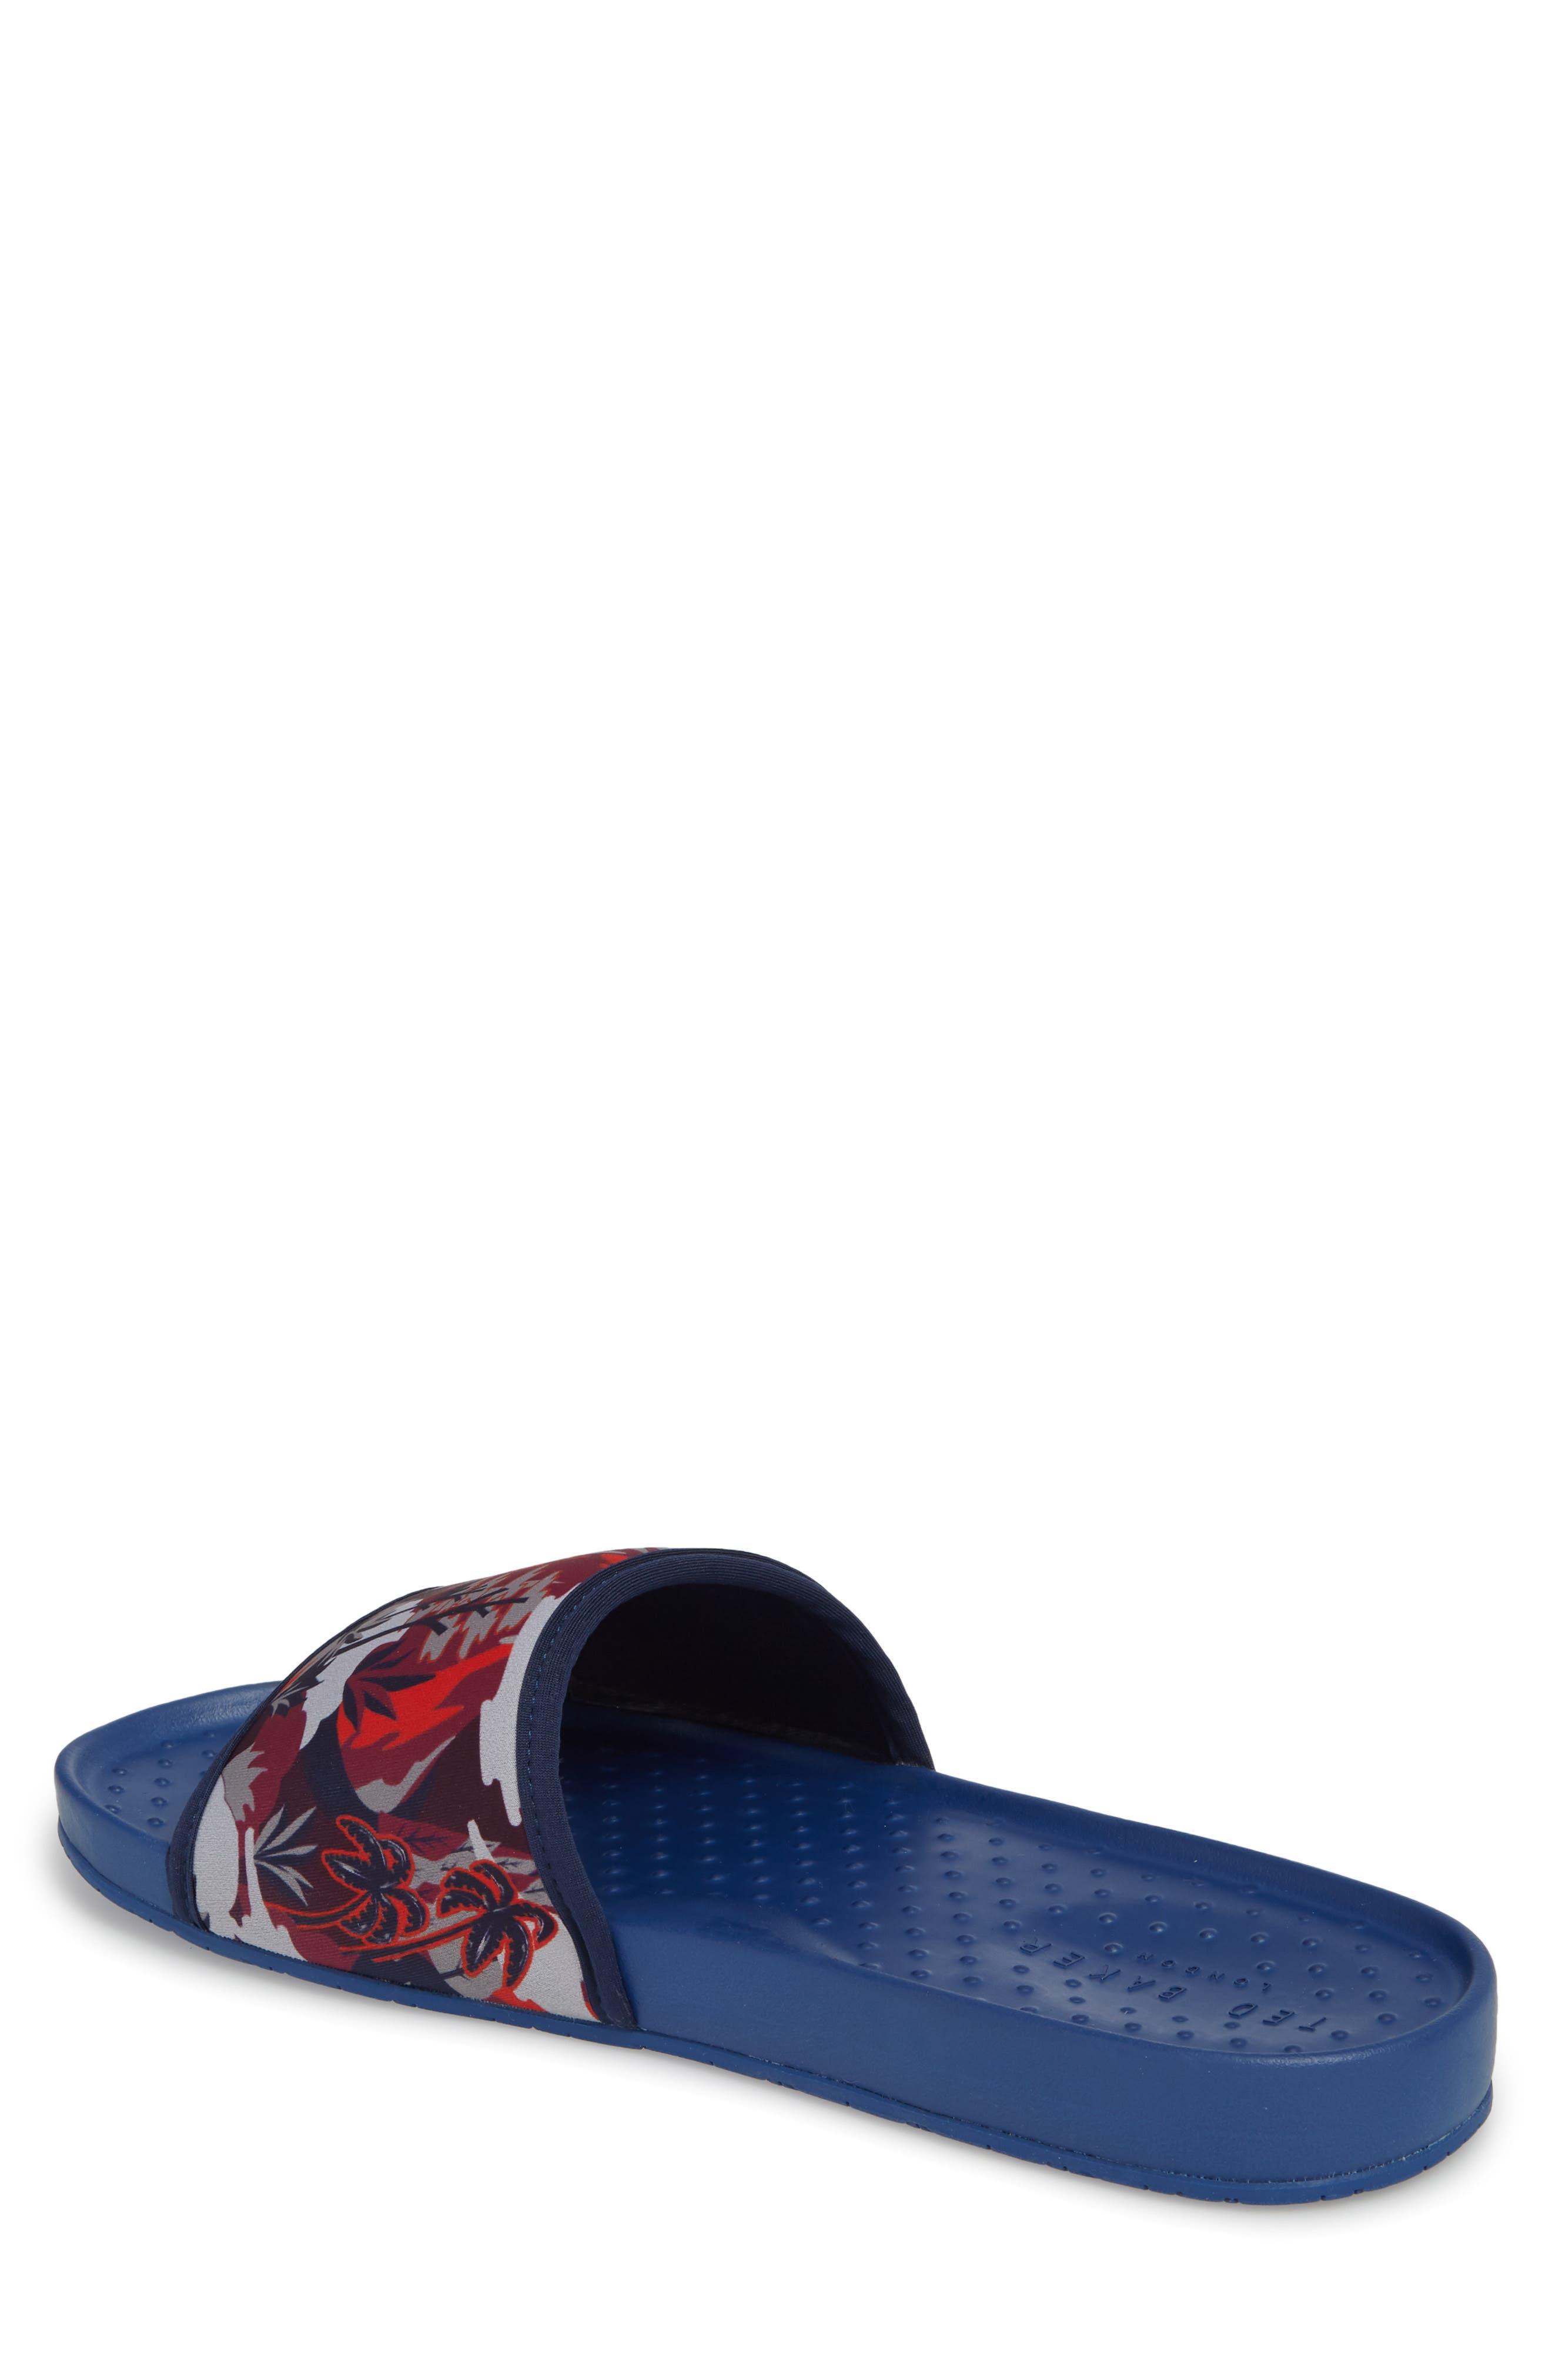 Sauldi 2 Slide Sandal,                             Alternate thumbnail 2, color,                             Dark Blue